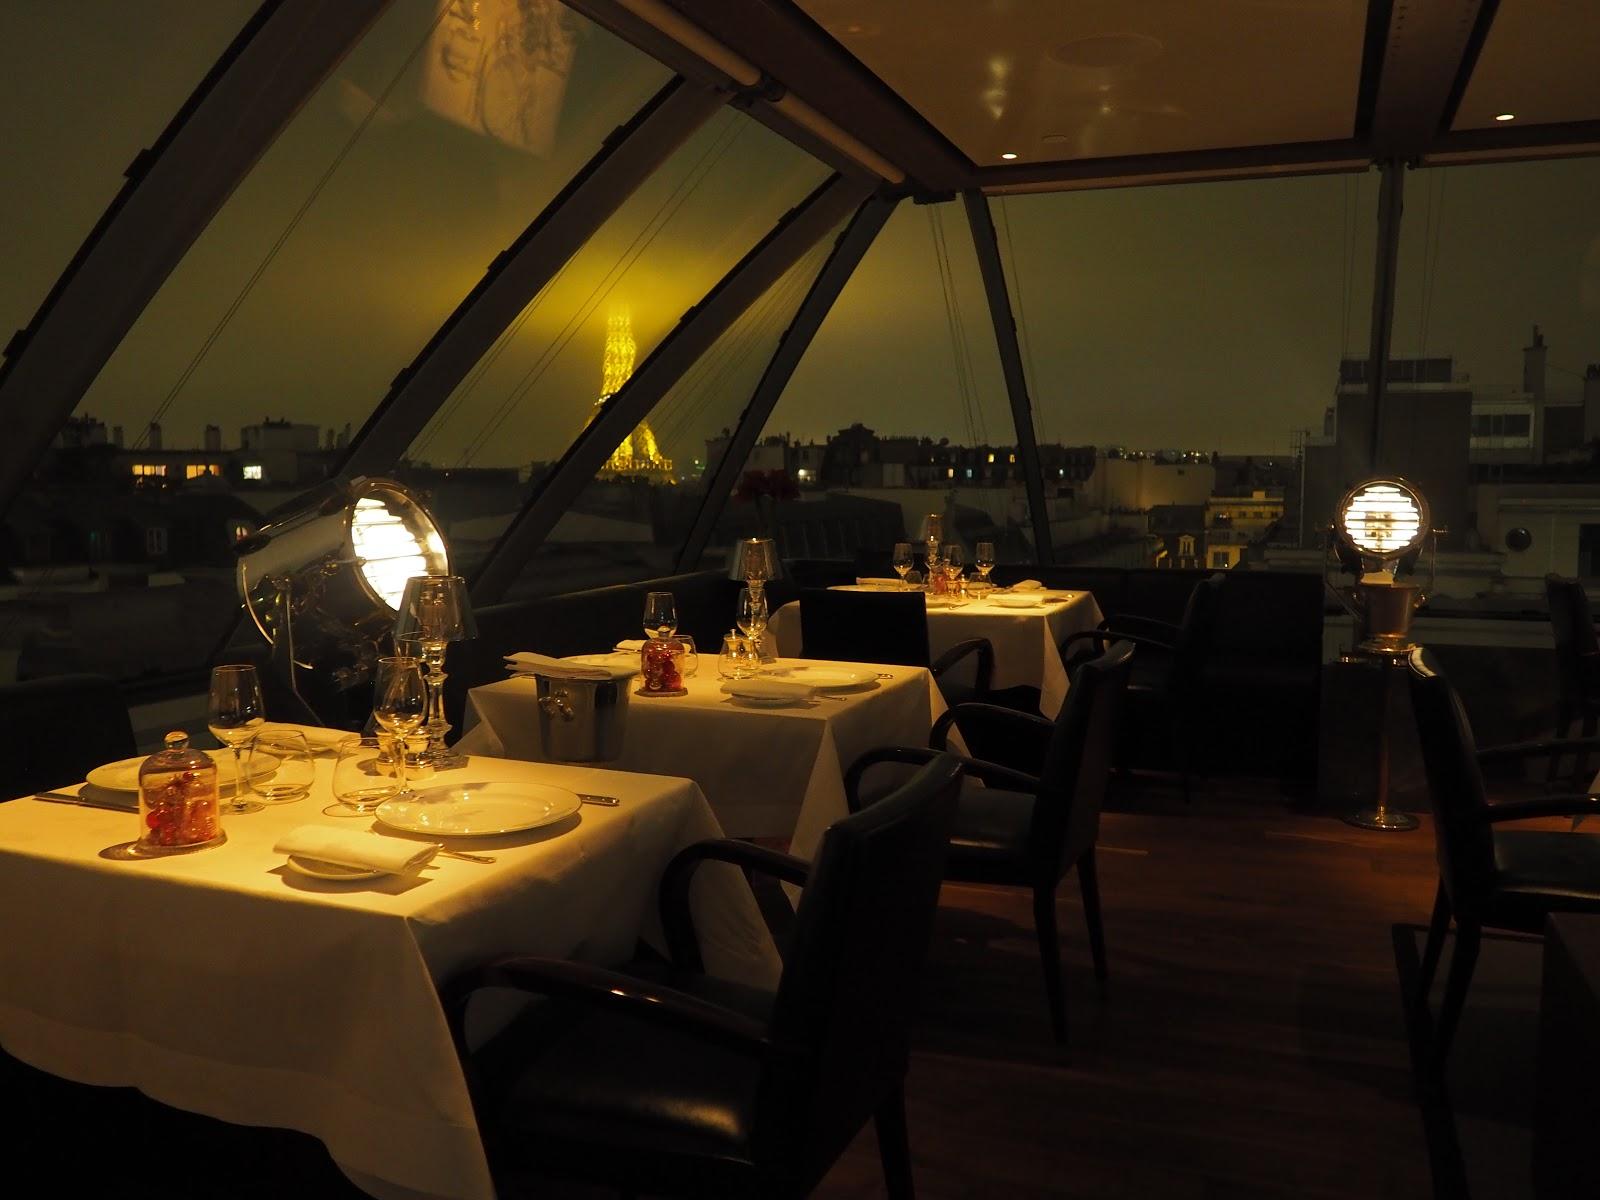 L'oiseau Blanc, Peninsula Hotel, Paris at night time